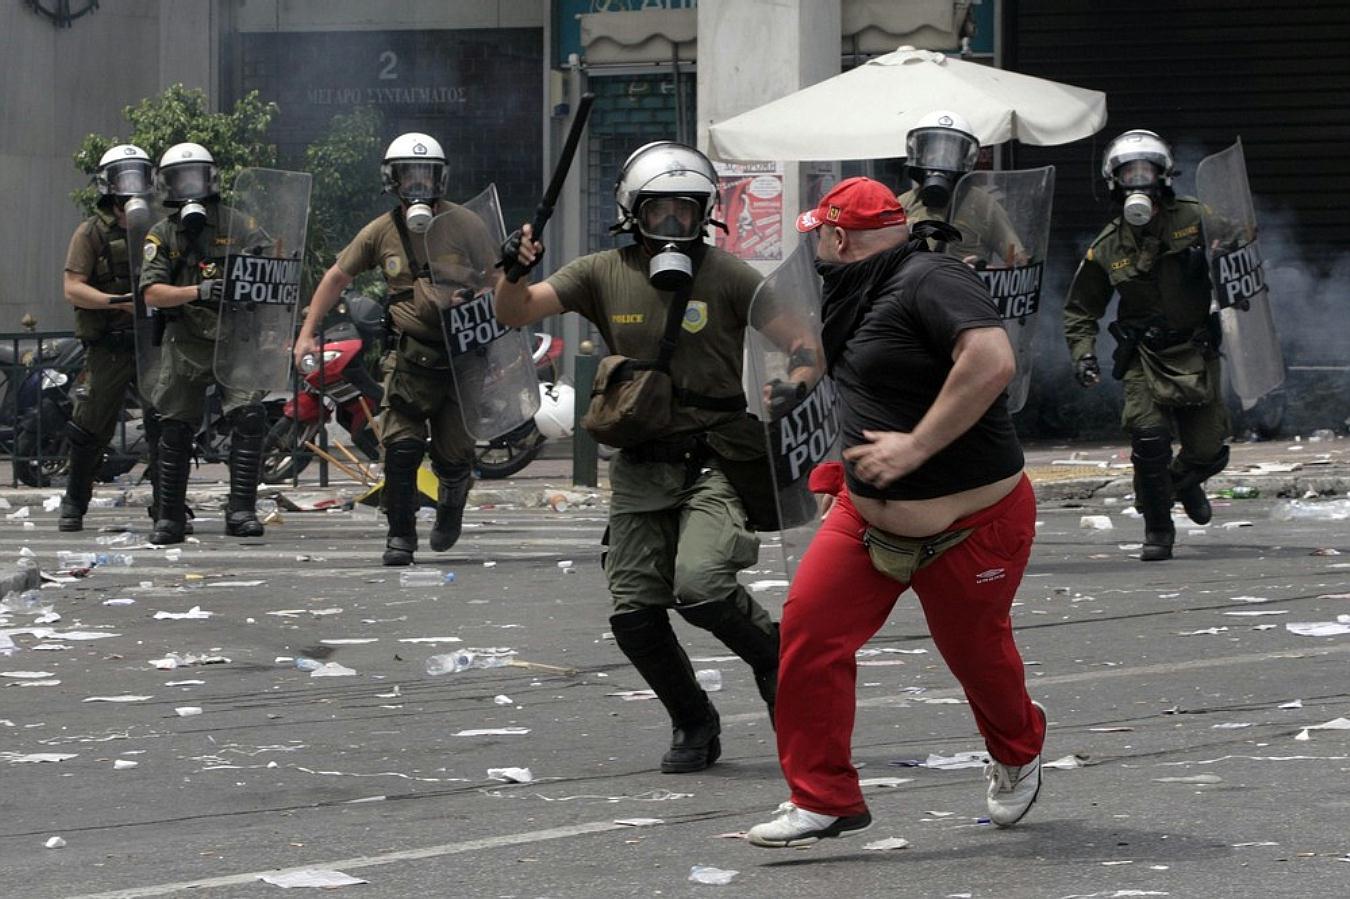 Jornadas de protesta Grecia 2011. Pict5